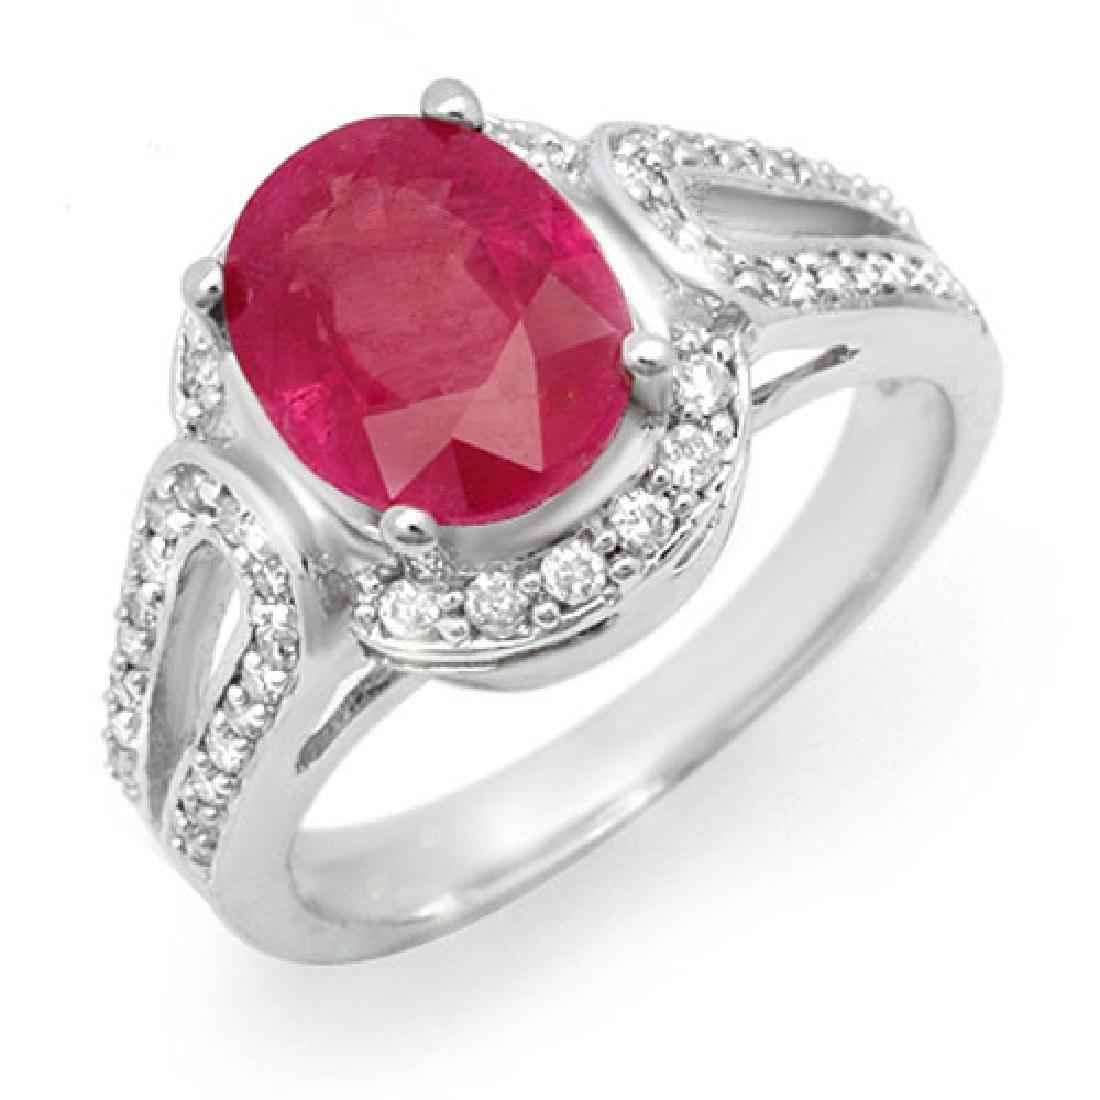 4.50 CTW Ruby & Diamond Ring 10K White Gold